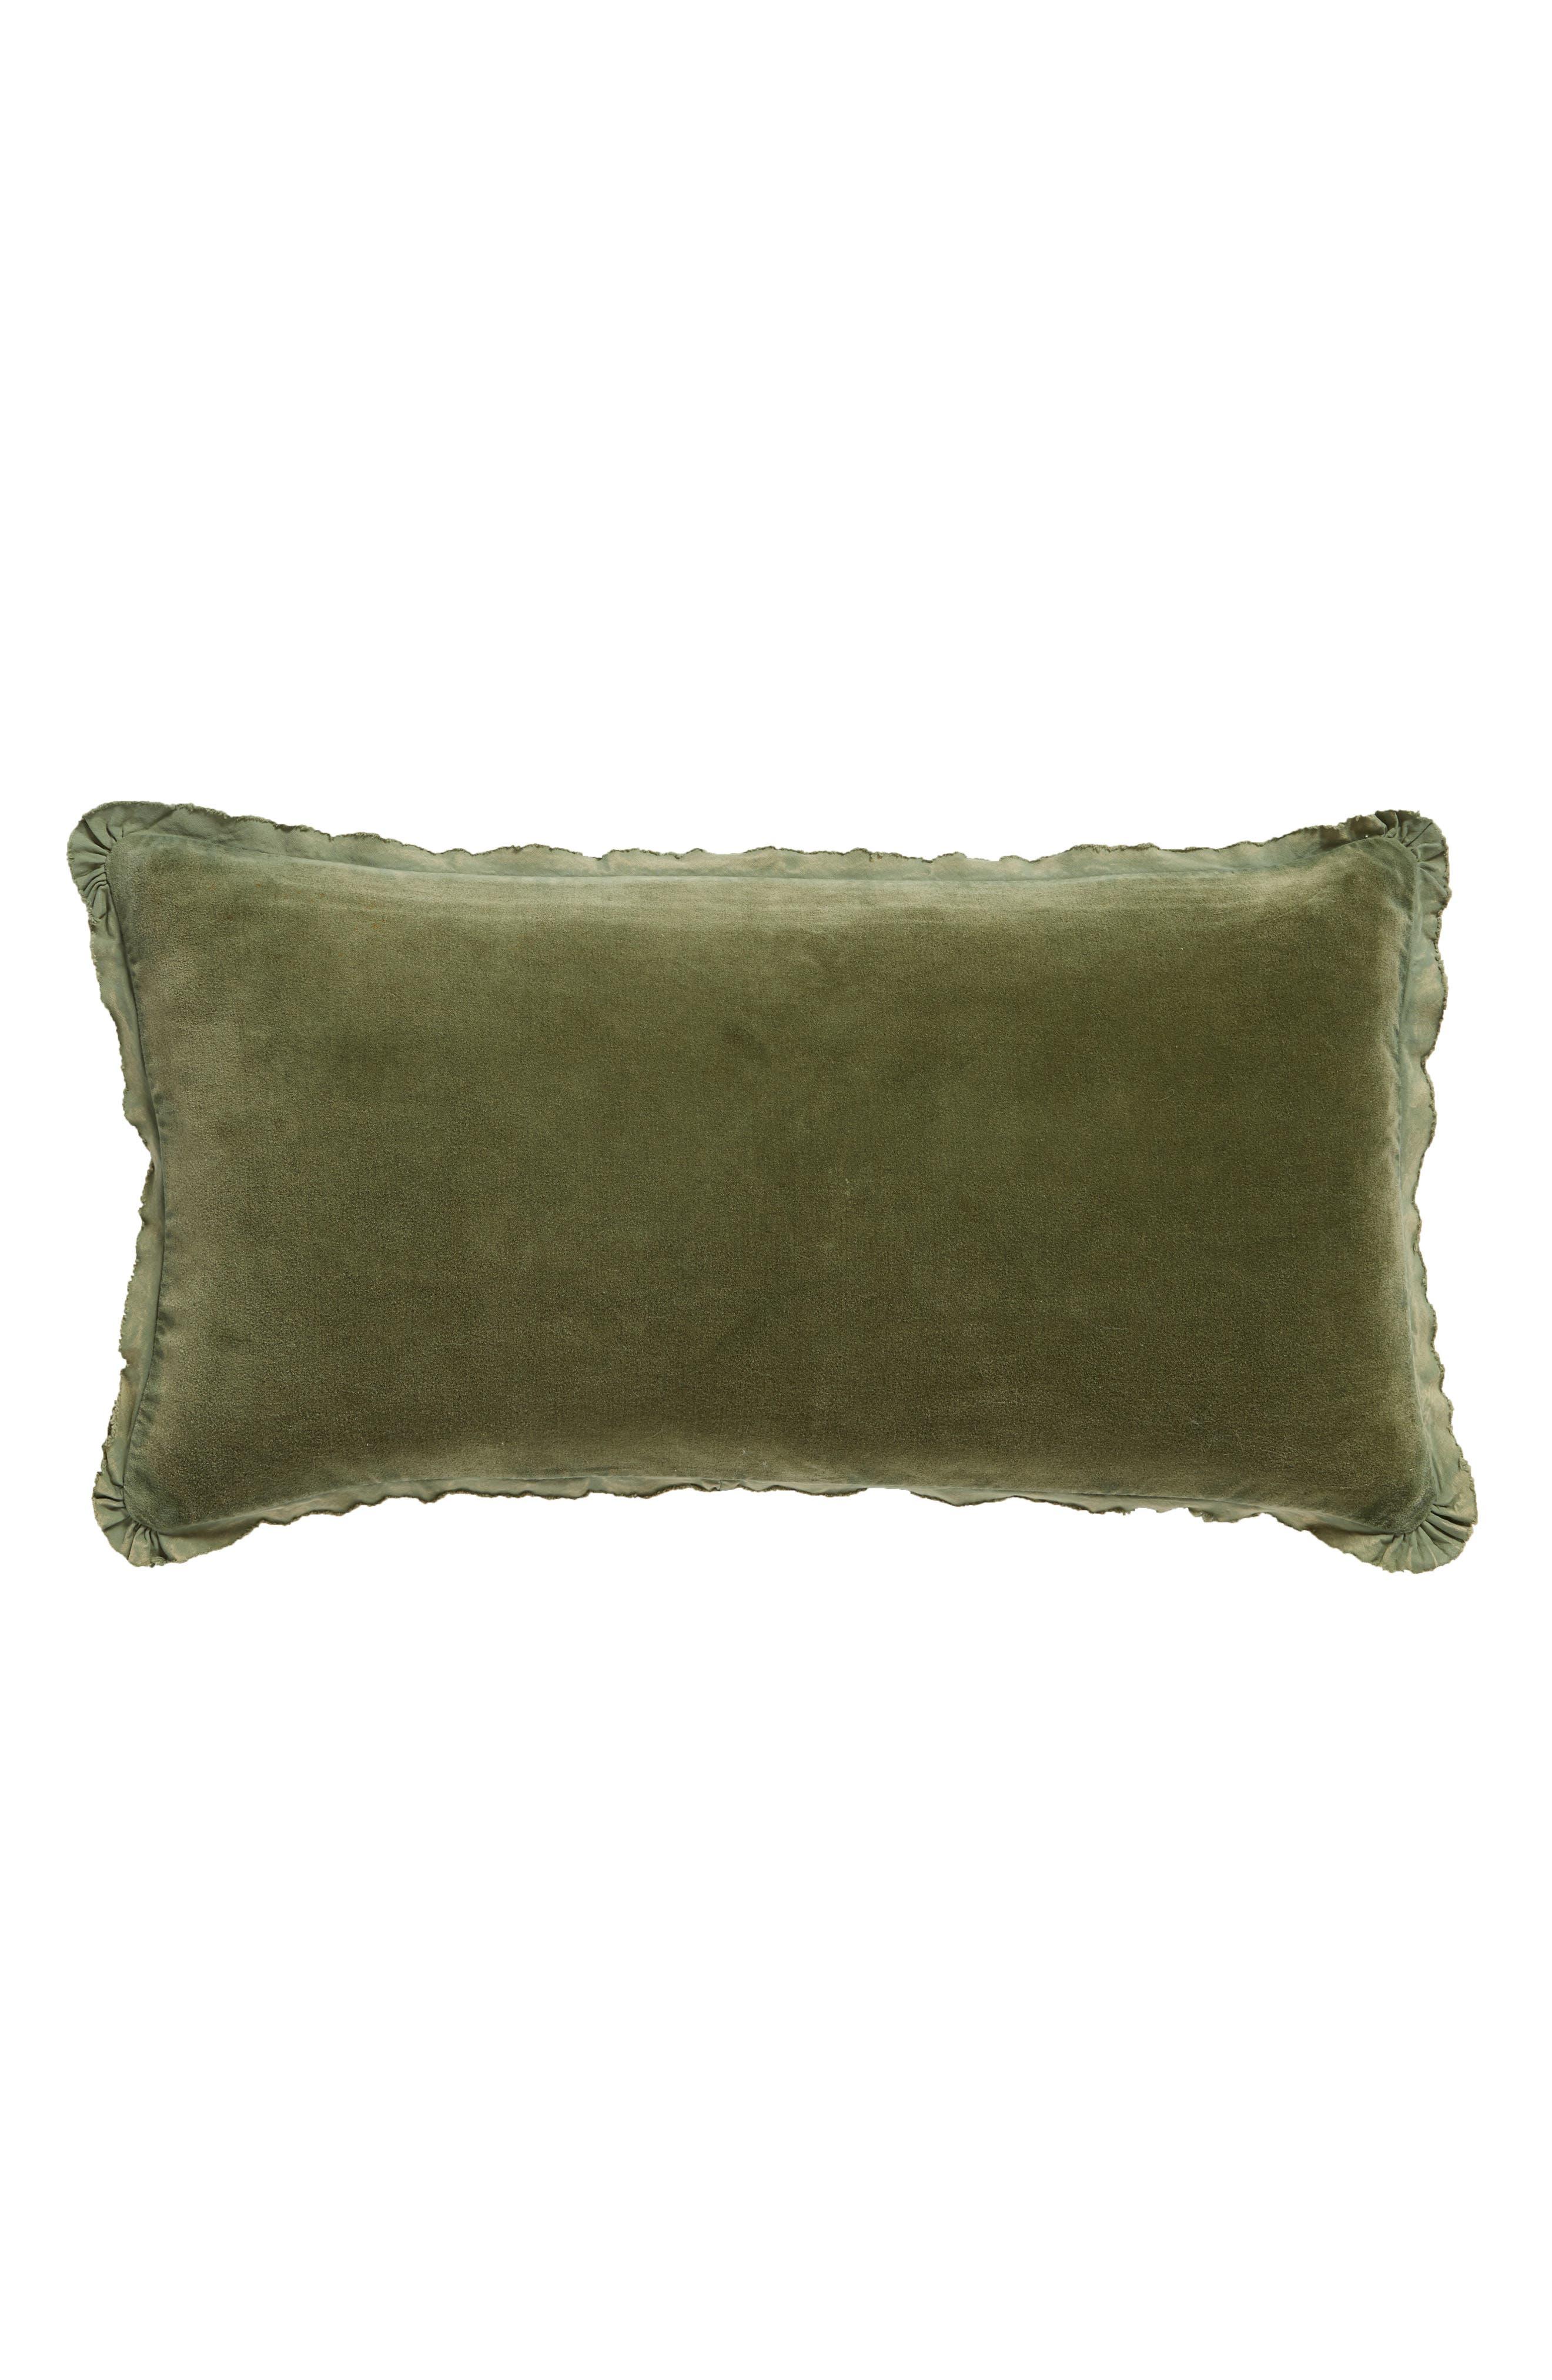 Velvet Accent Pillow,                             Main thumbnail 1, color,                             GREEN SORREL